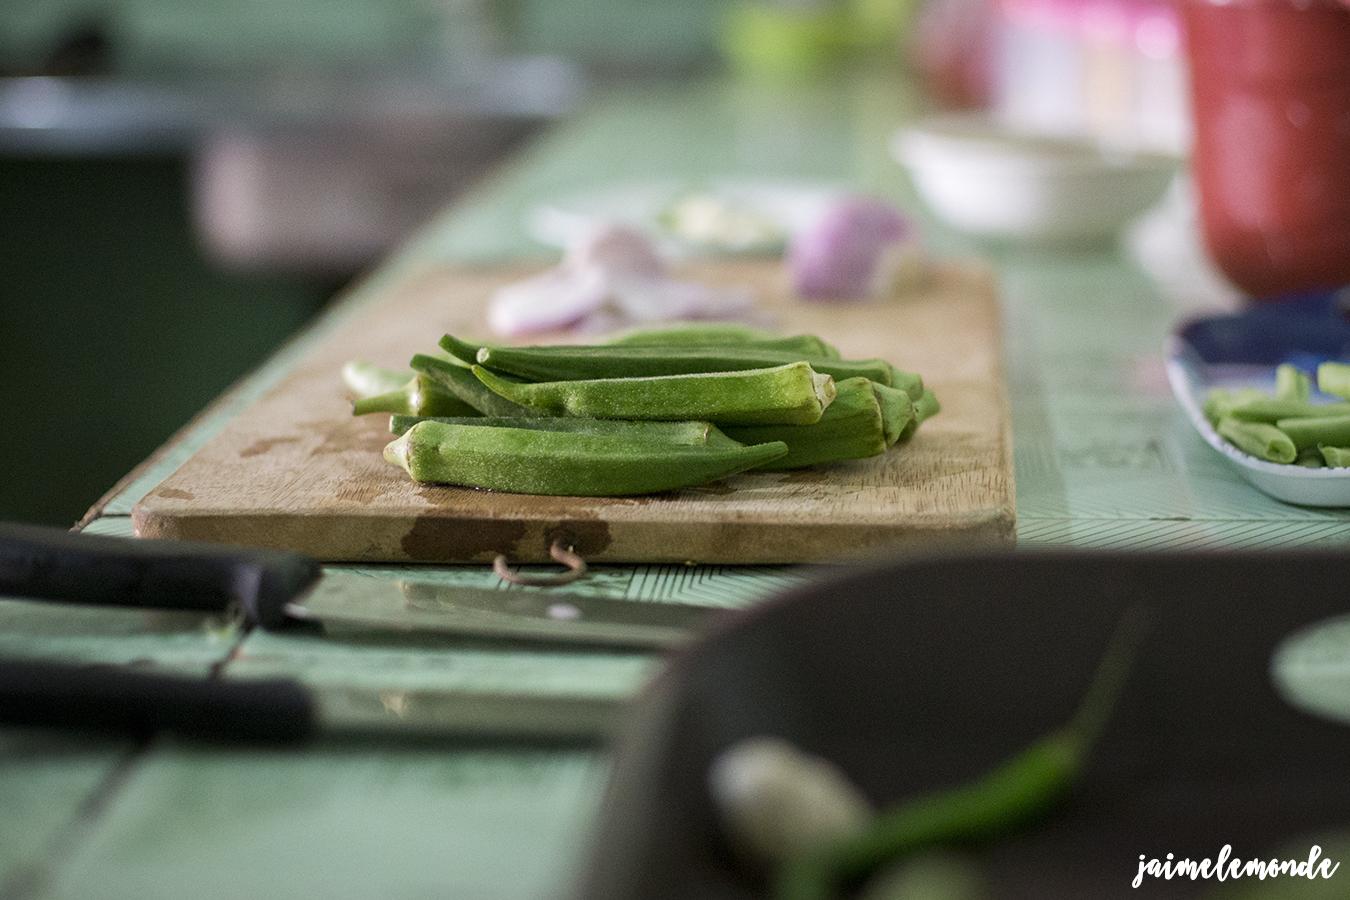 negombo-apprendre-a-cuisiner-avec-ragu-negombo-beach-house-guest-house-voyage-au-sri-lanka-jaimelemonde-10